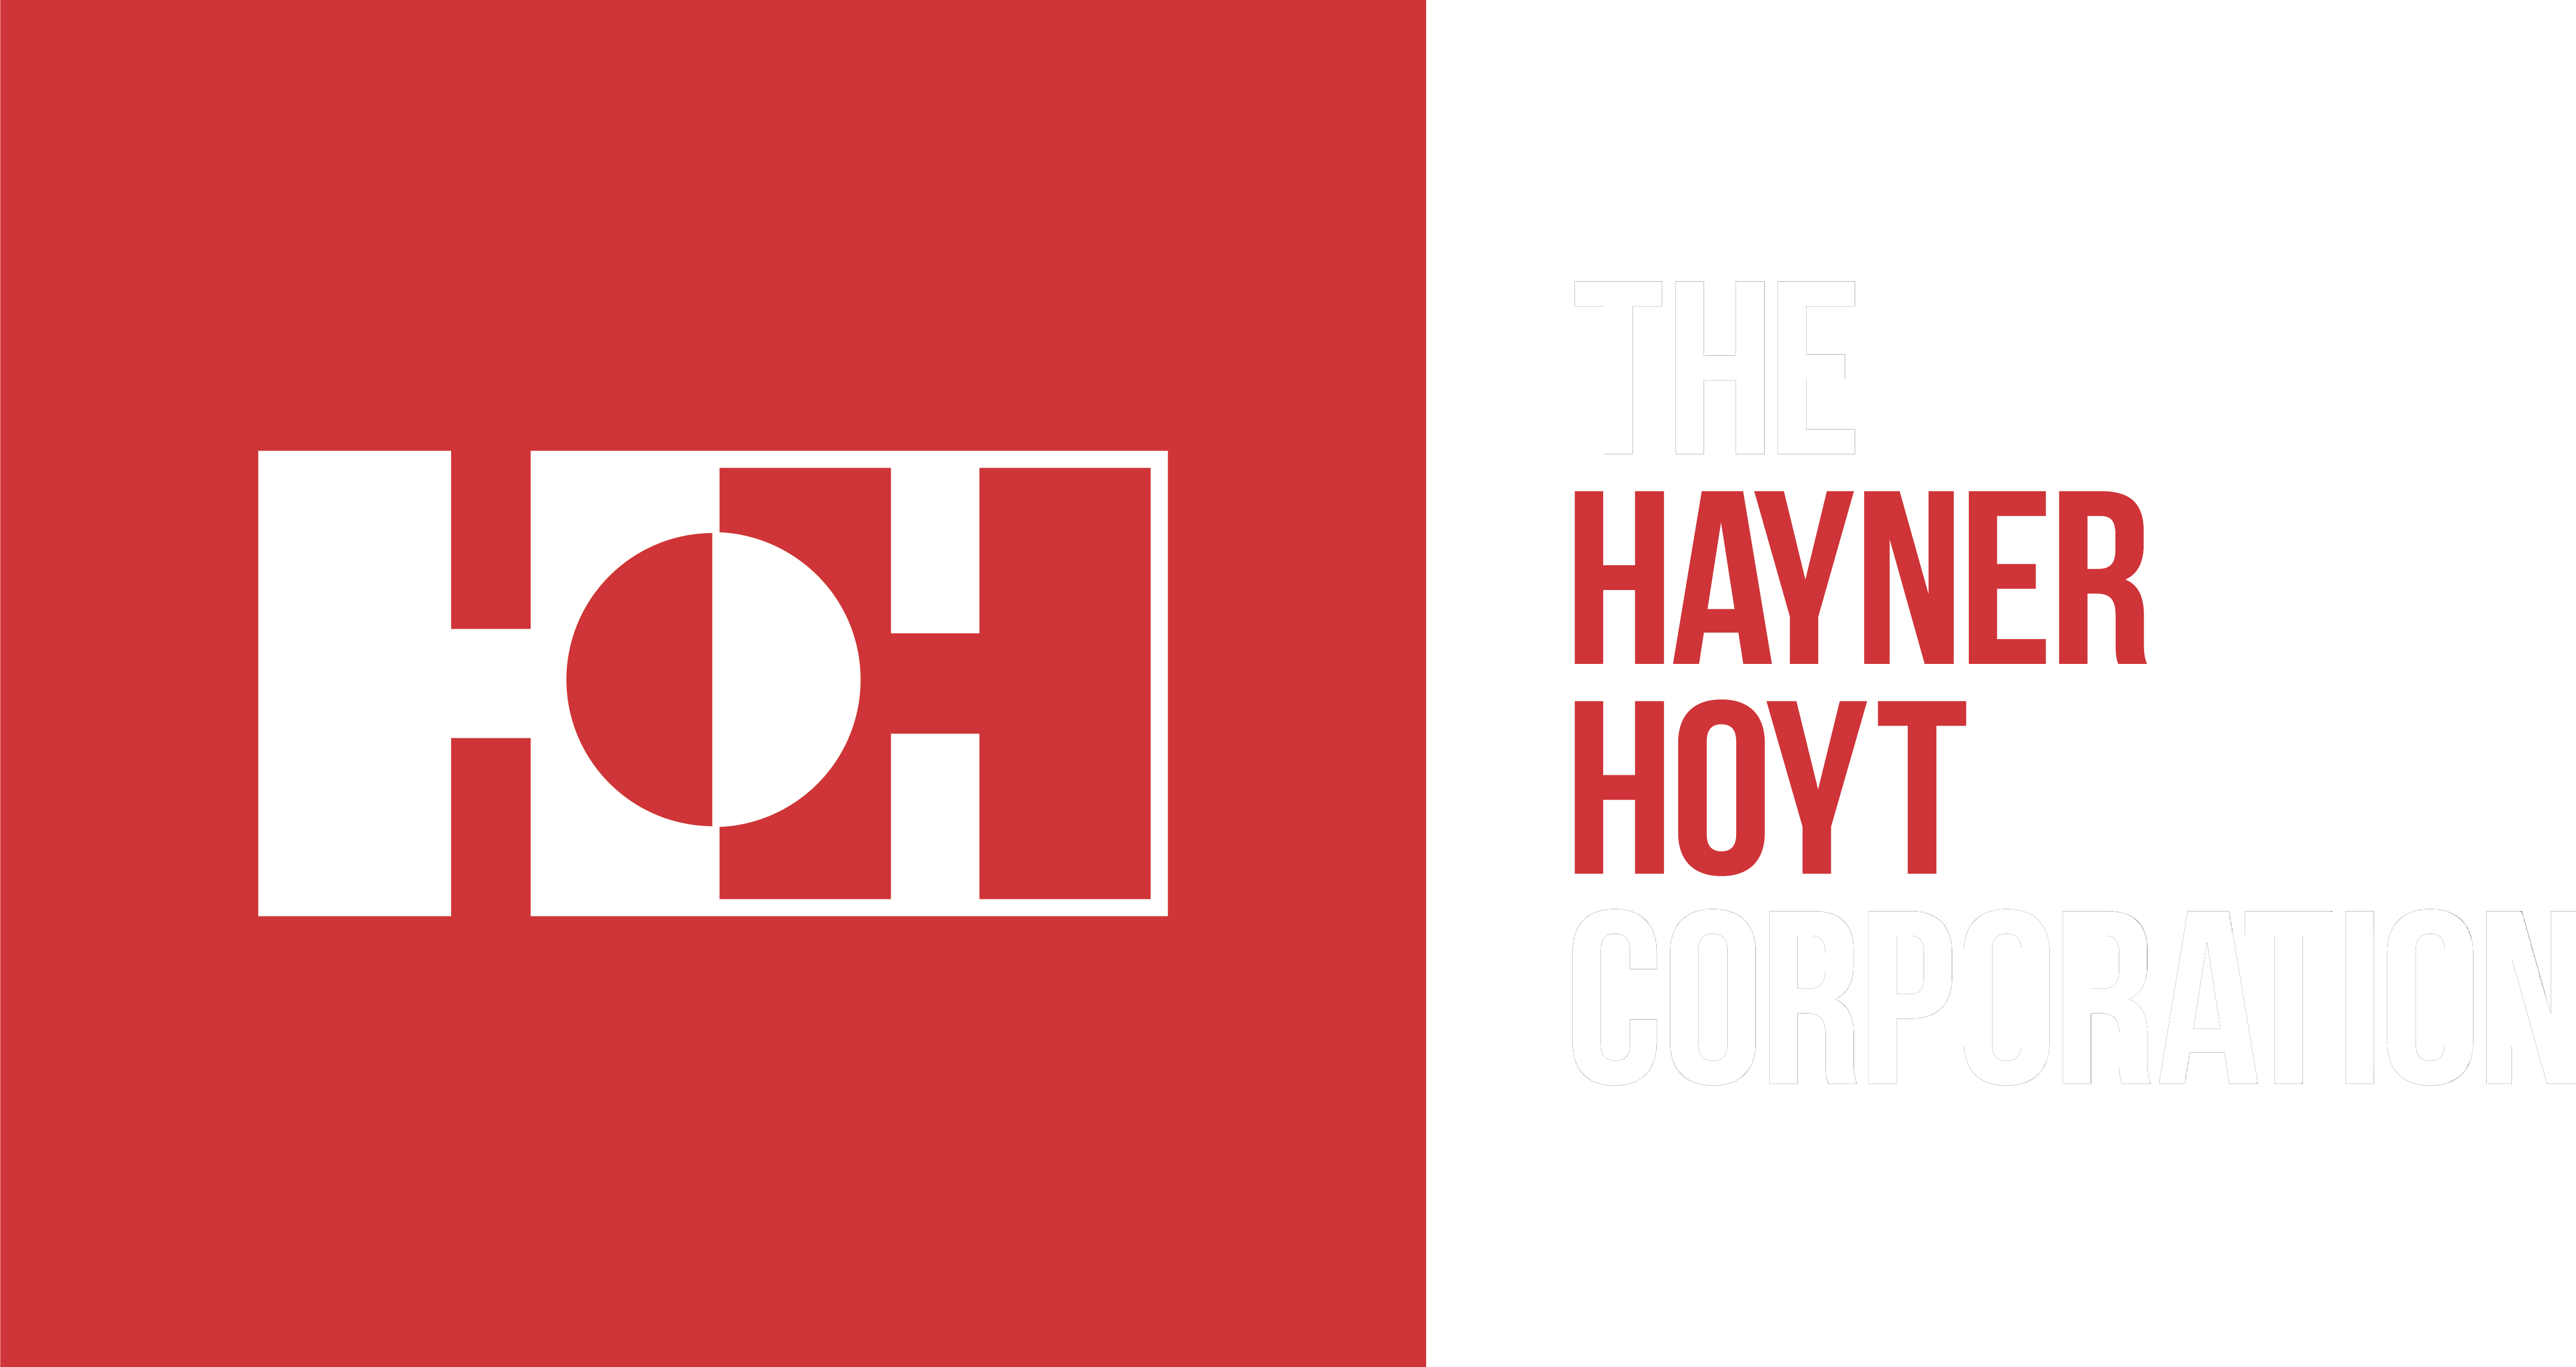 The Hayner Hoyt Corporation